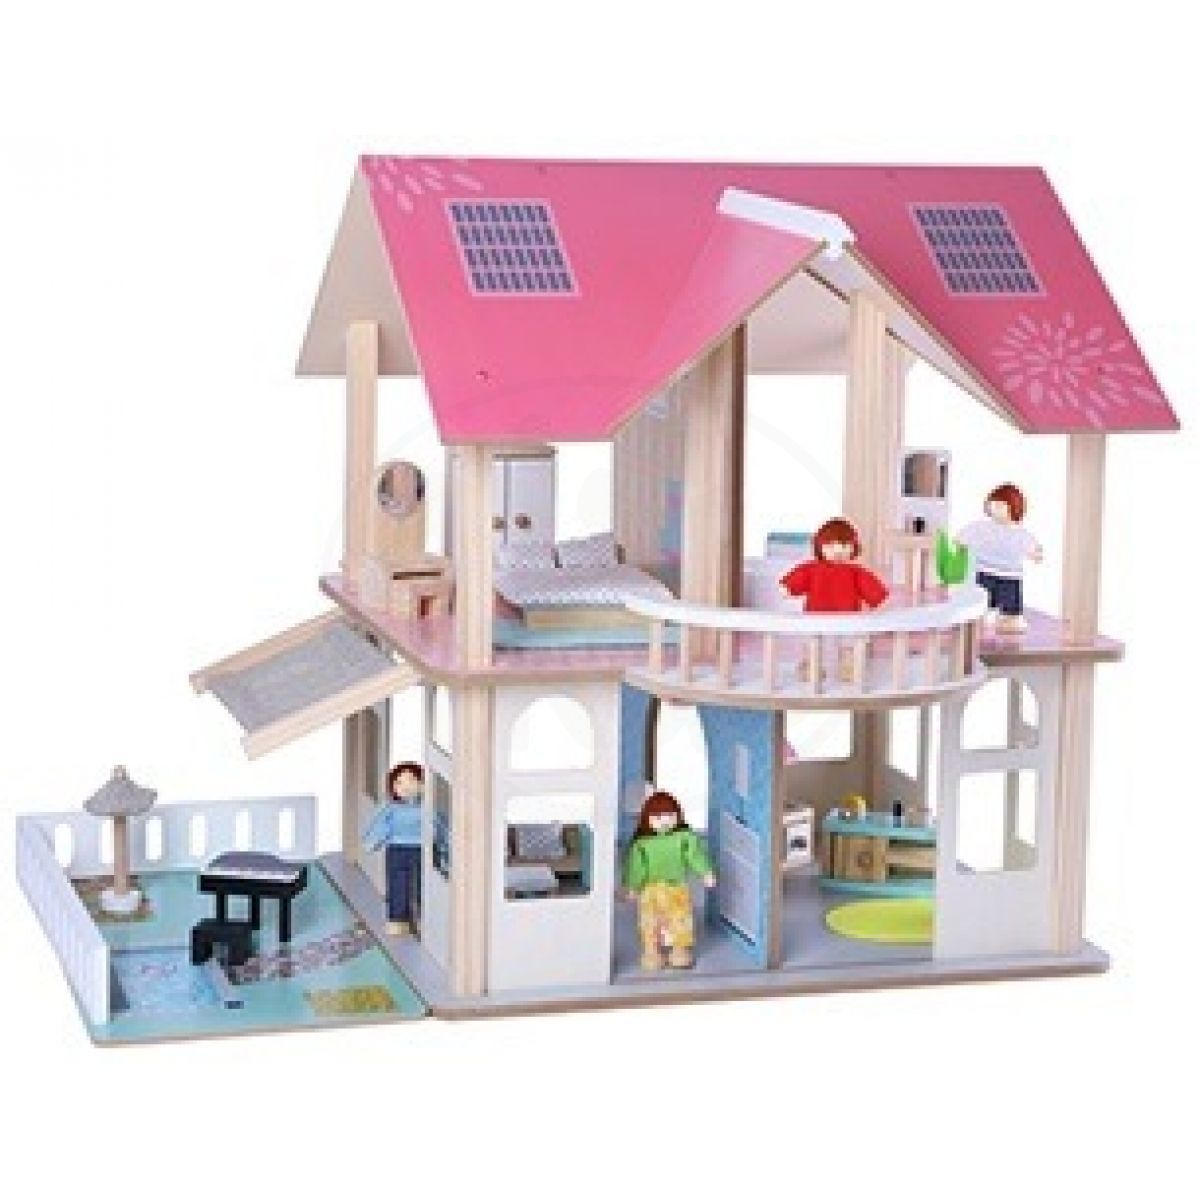 HM Studio Dům pro panenky 31 ks